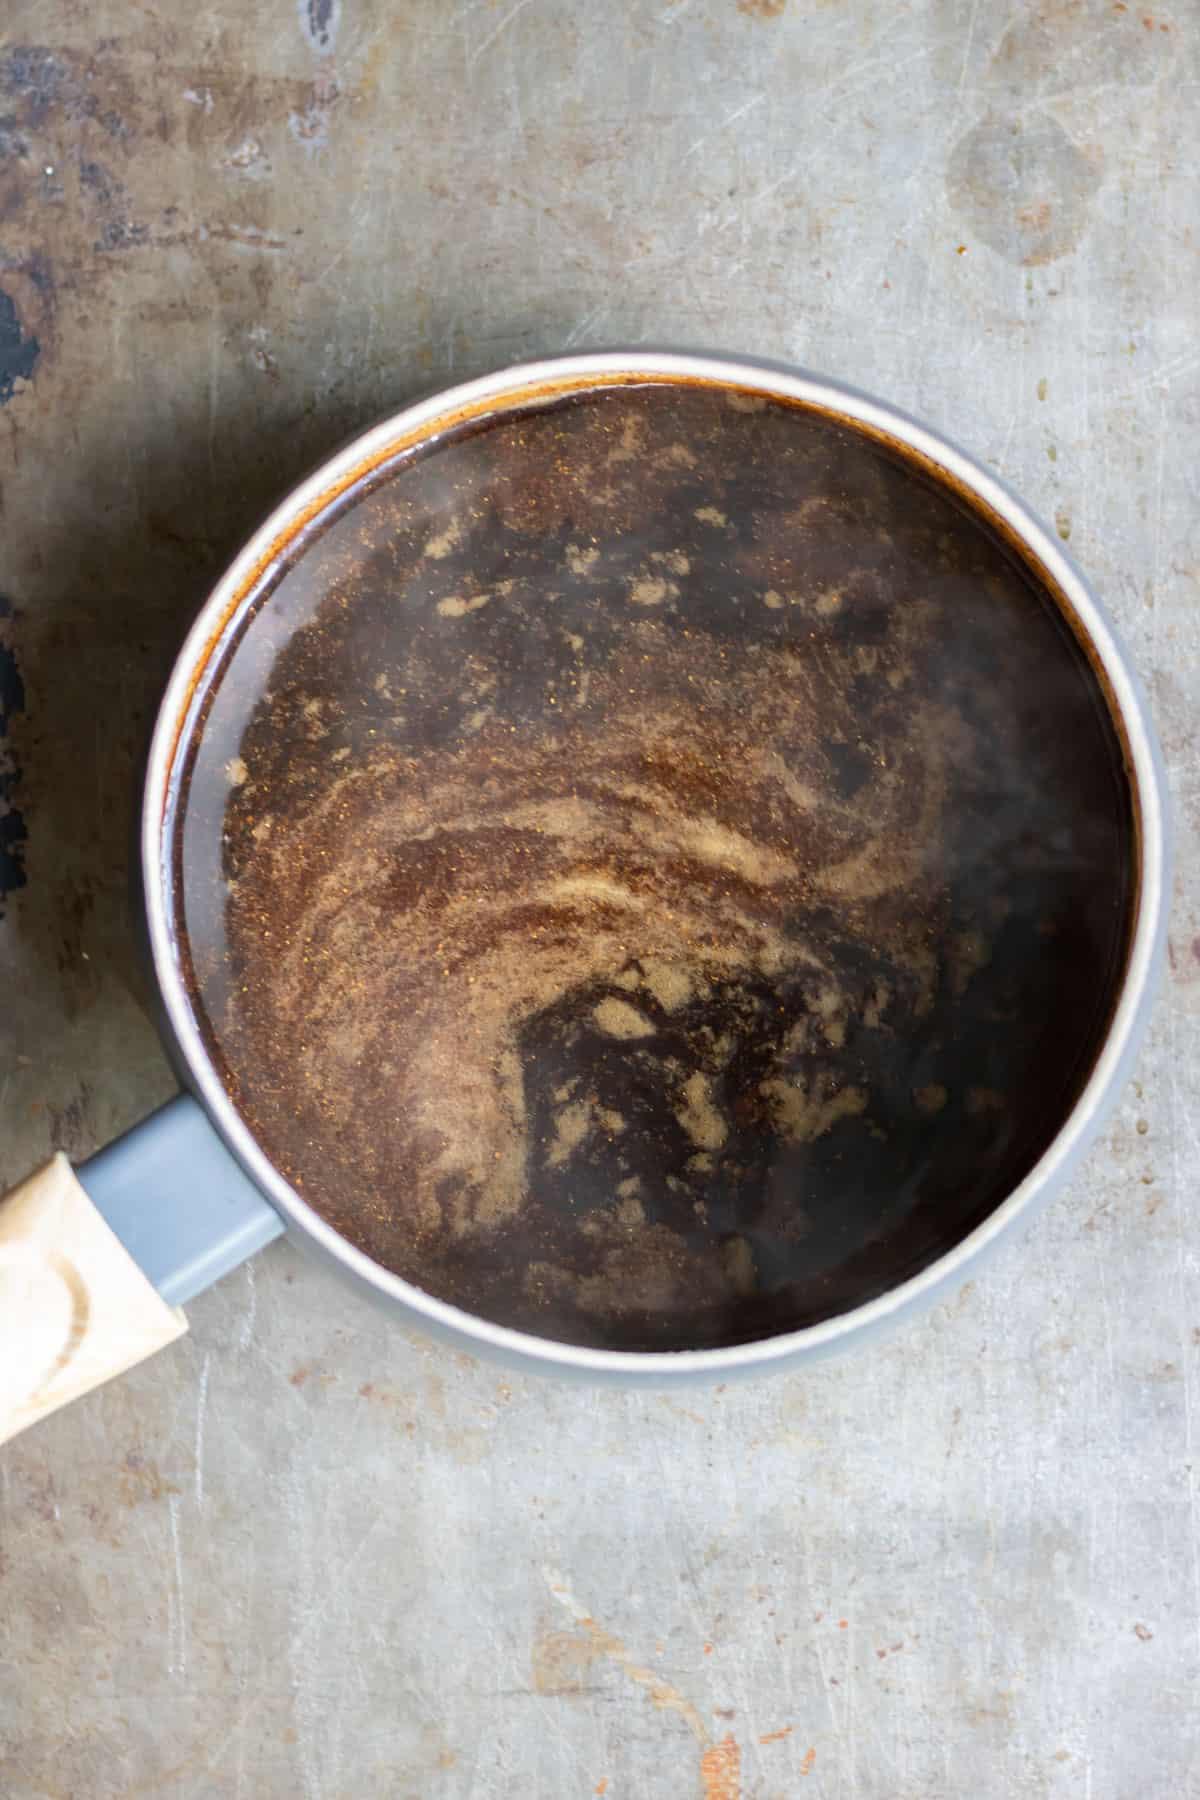 Pan of cooked vegan worcestershire sauce.